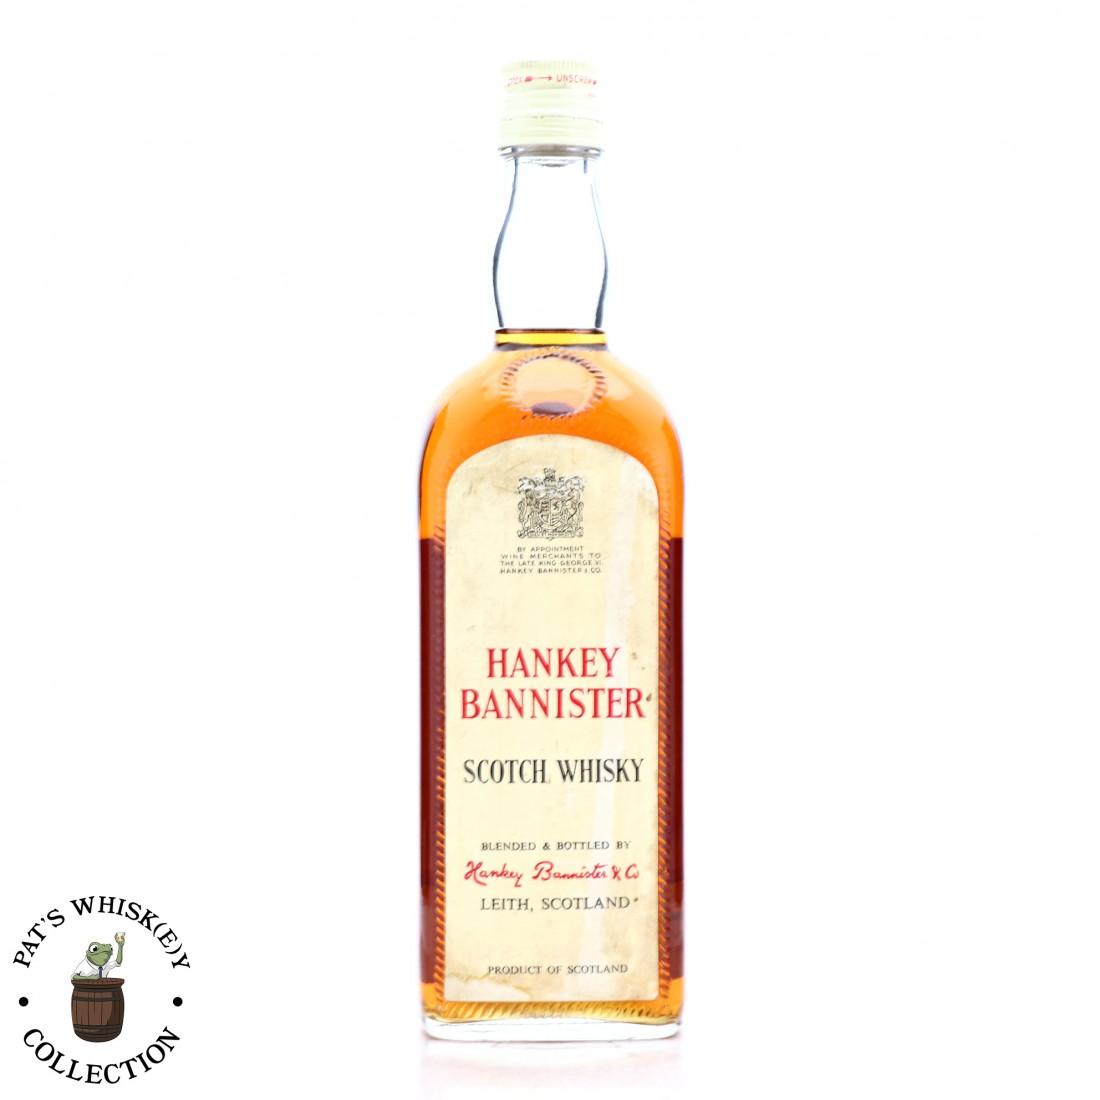 Hankey Bannister 1950s/60s